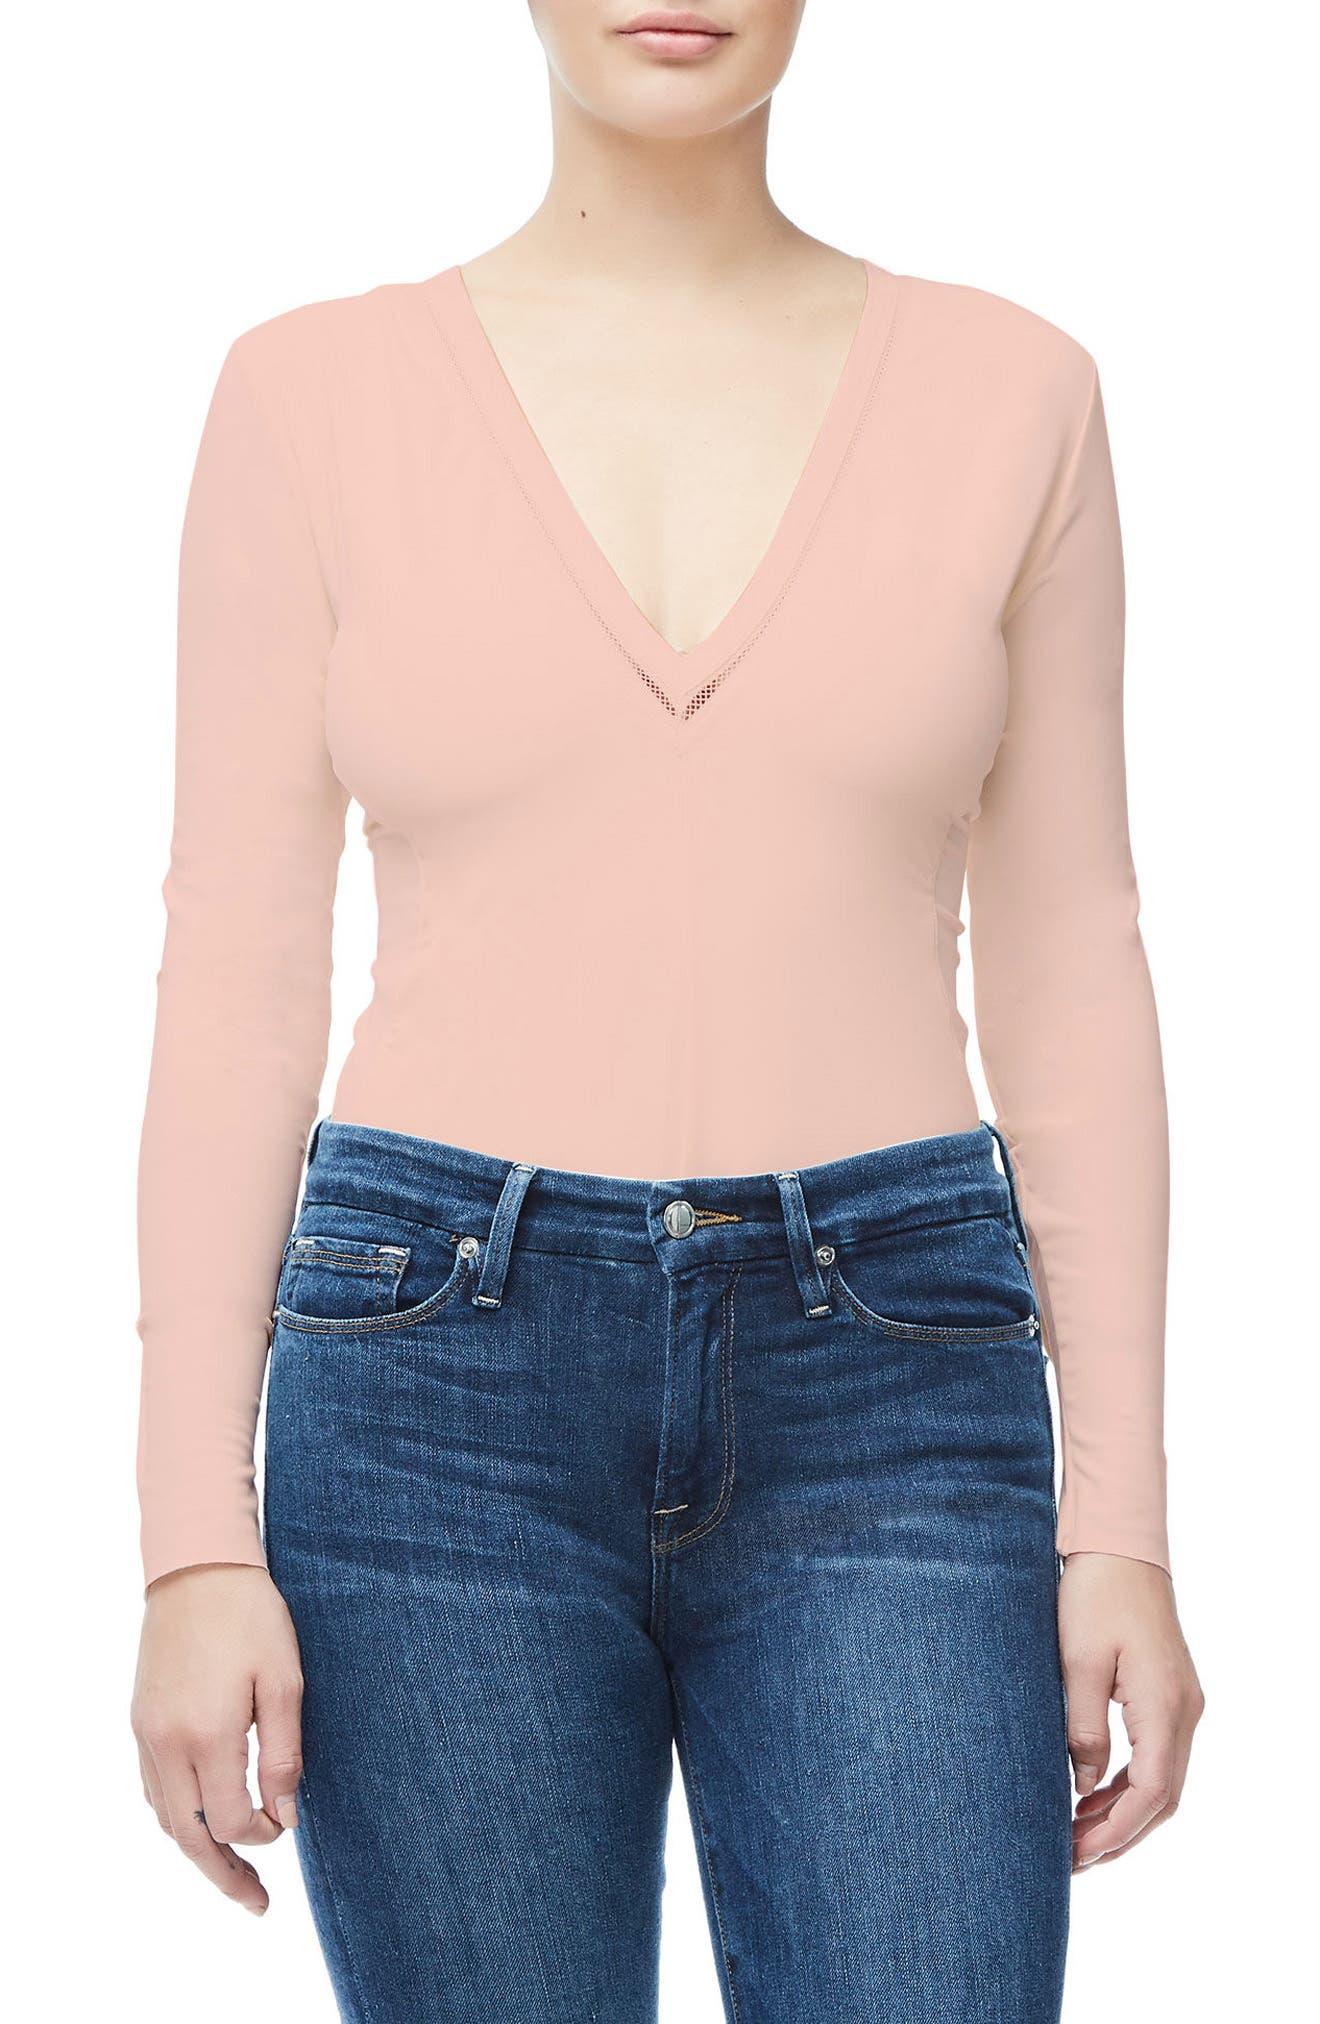 Good Body Low Down Thong Bodysuit,                         Main,                         color, Blush001